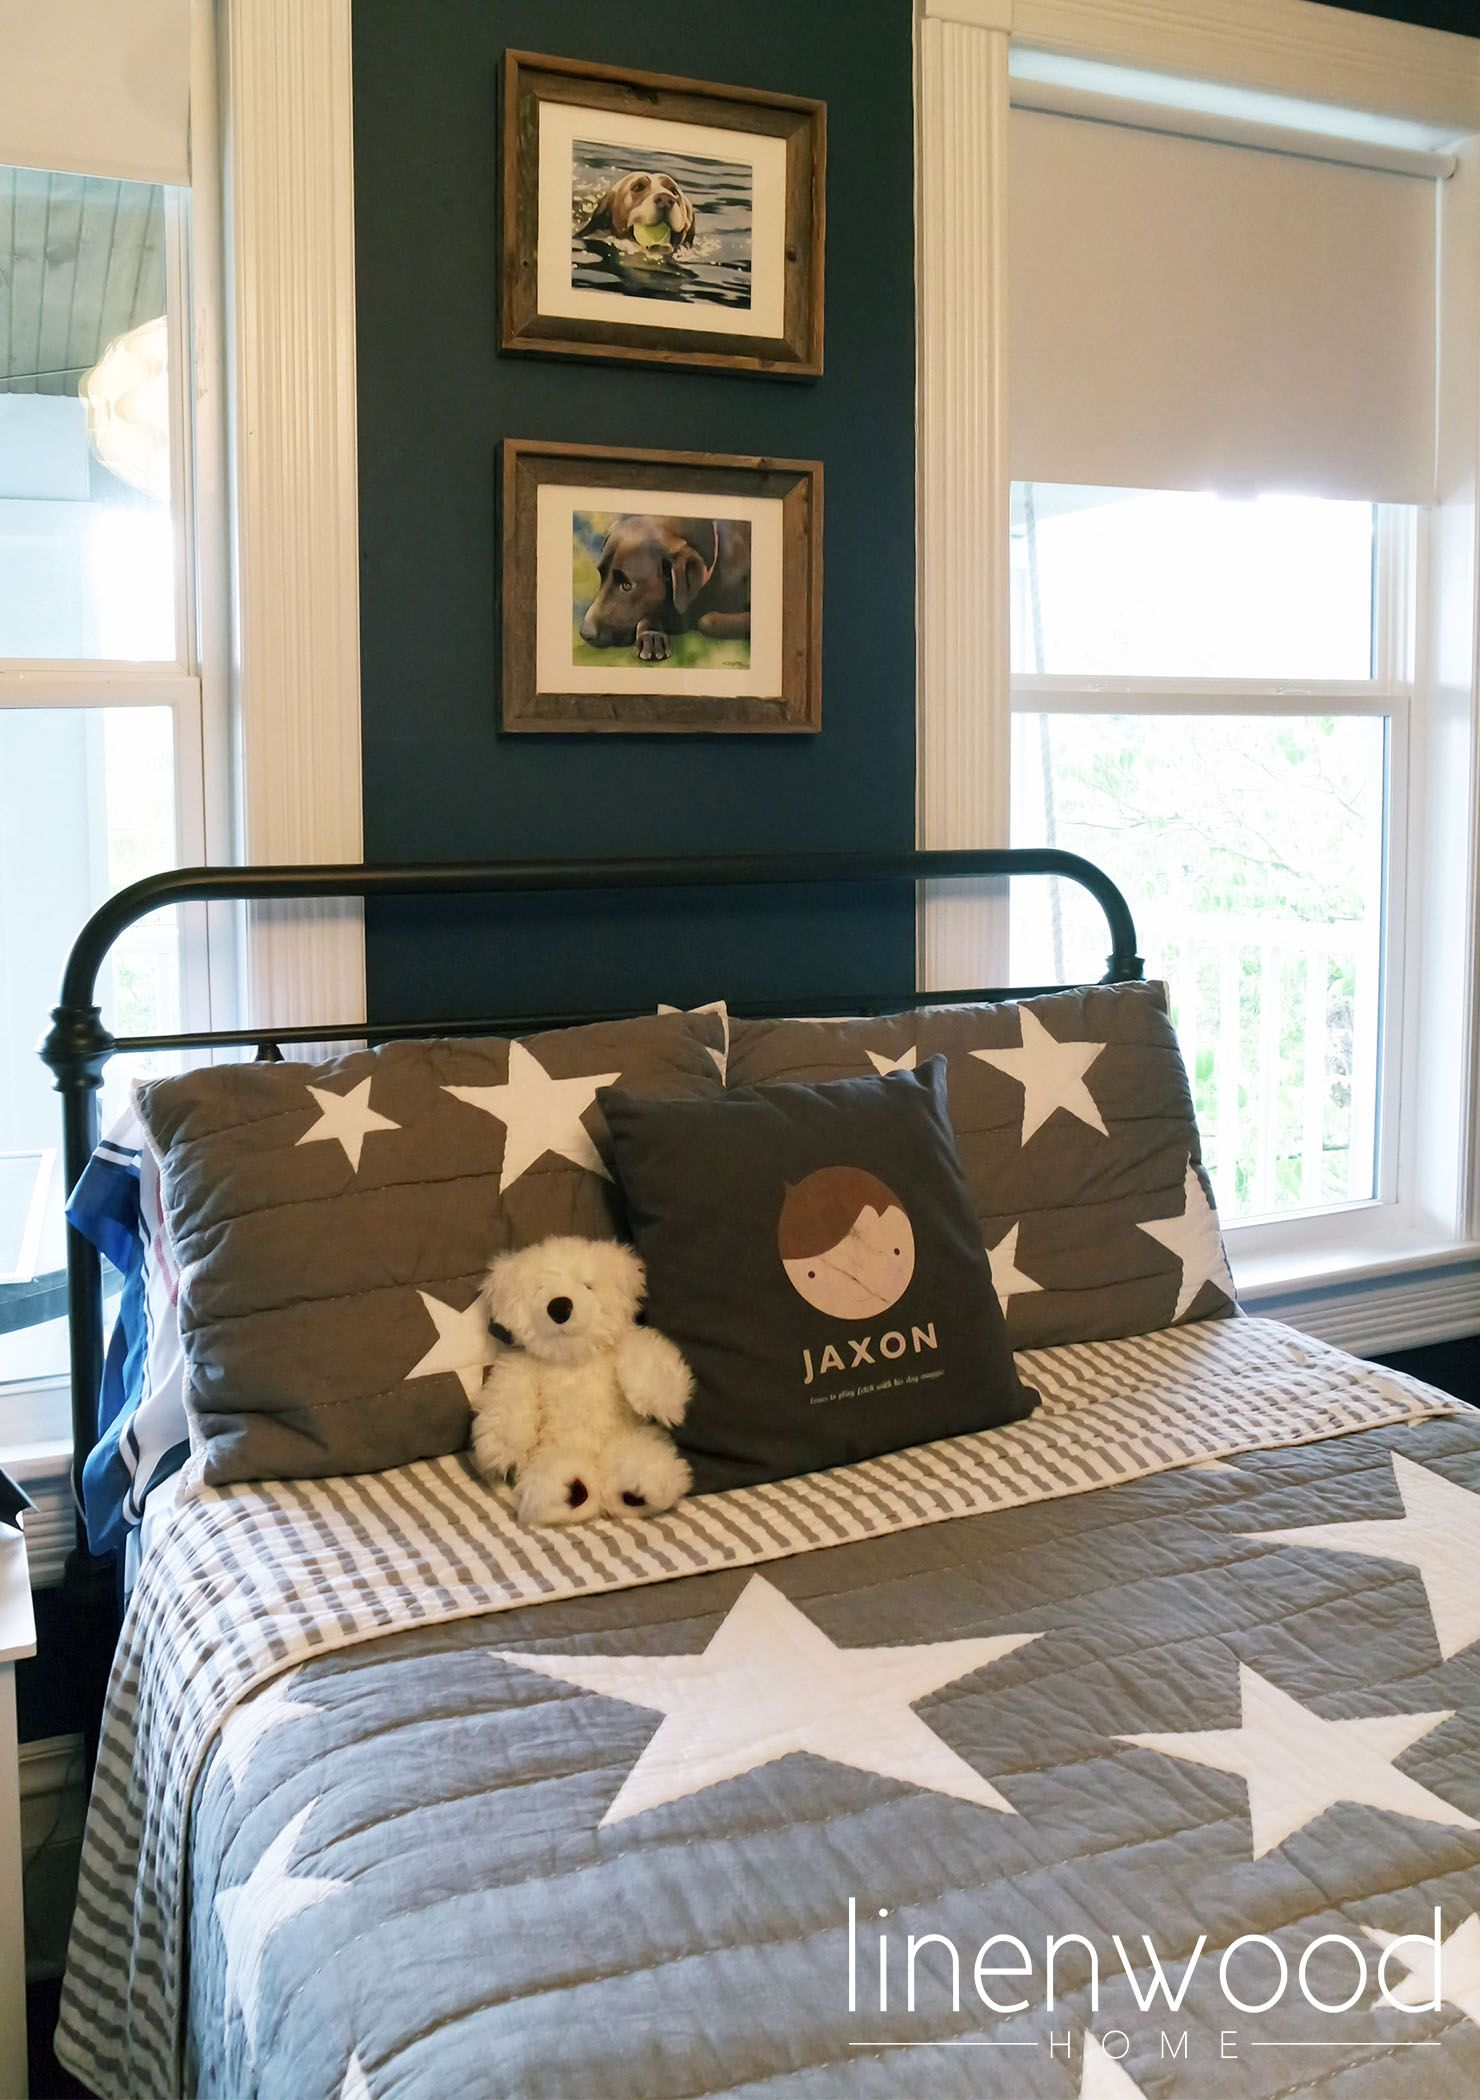 Grey Star Bedding From Target For A Subtle Star Wars Boys Room Www Linenwoodhome Com Star Wars Boys Room Toddler Rooms Boy Room